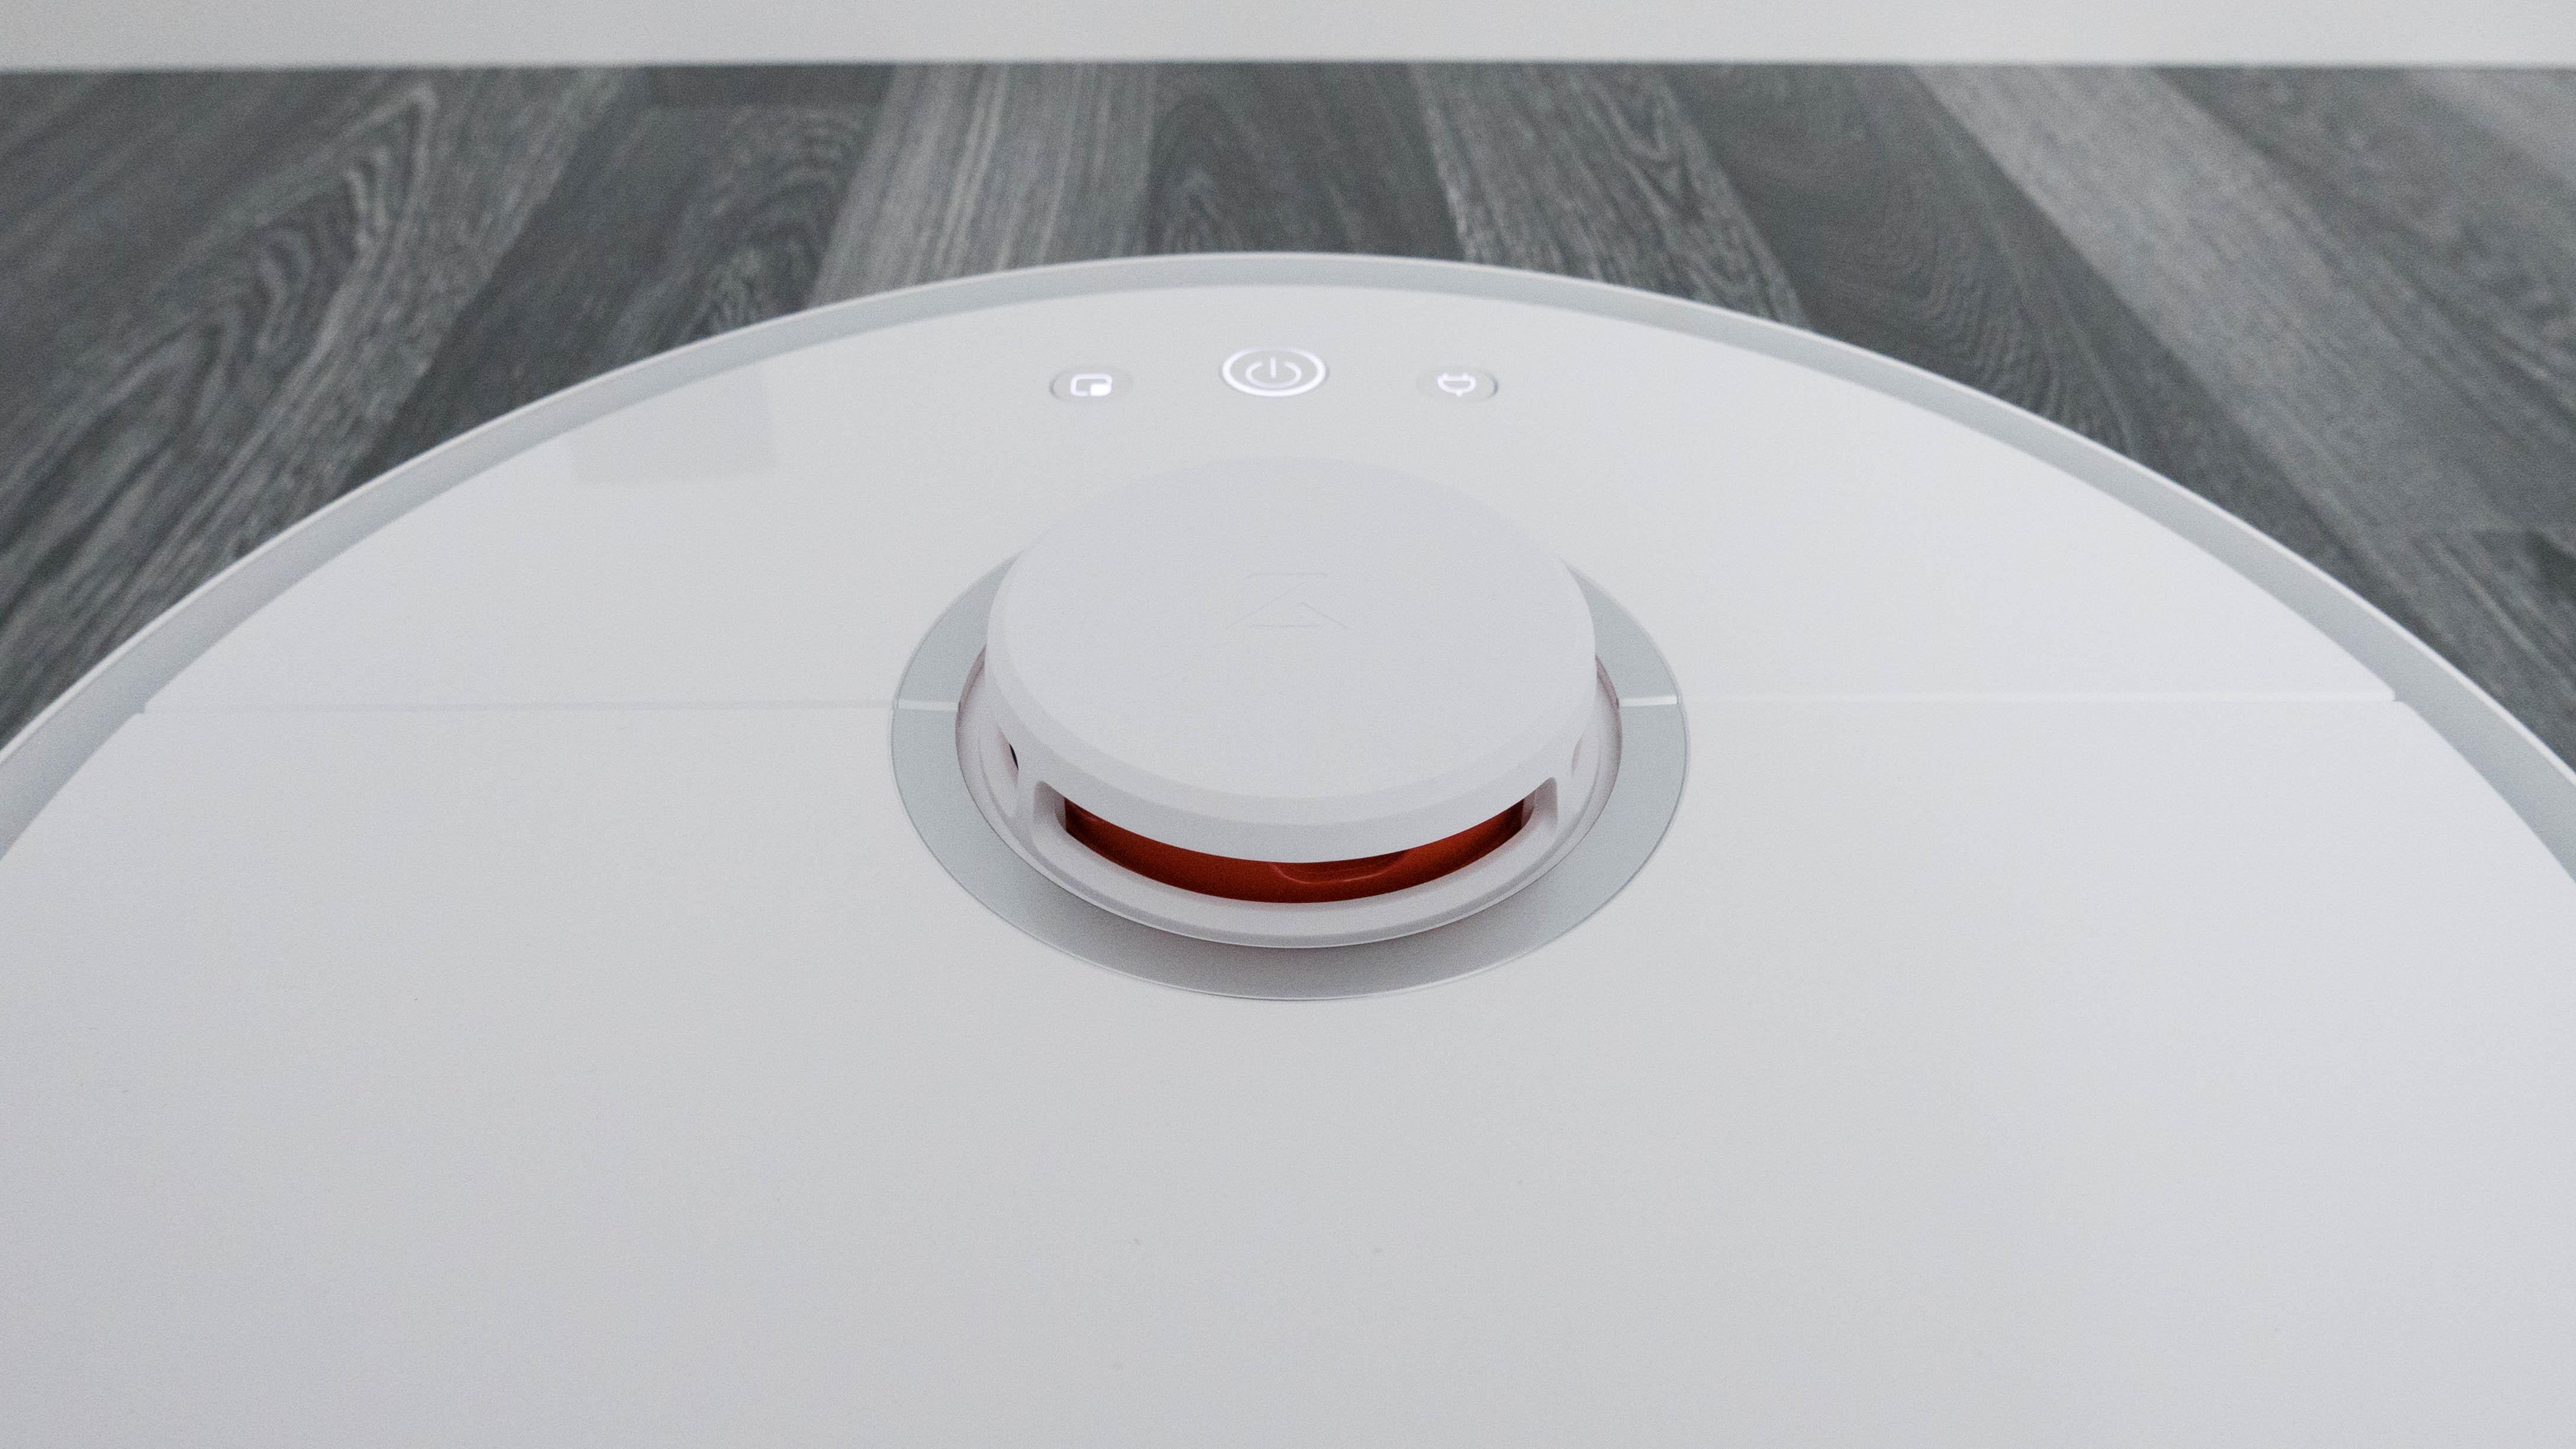 Xiaomi Mi Robot 2 Roborock S50 Roboter Details 11